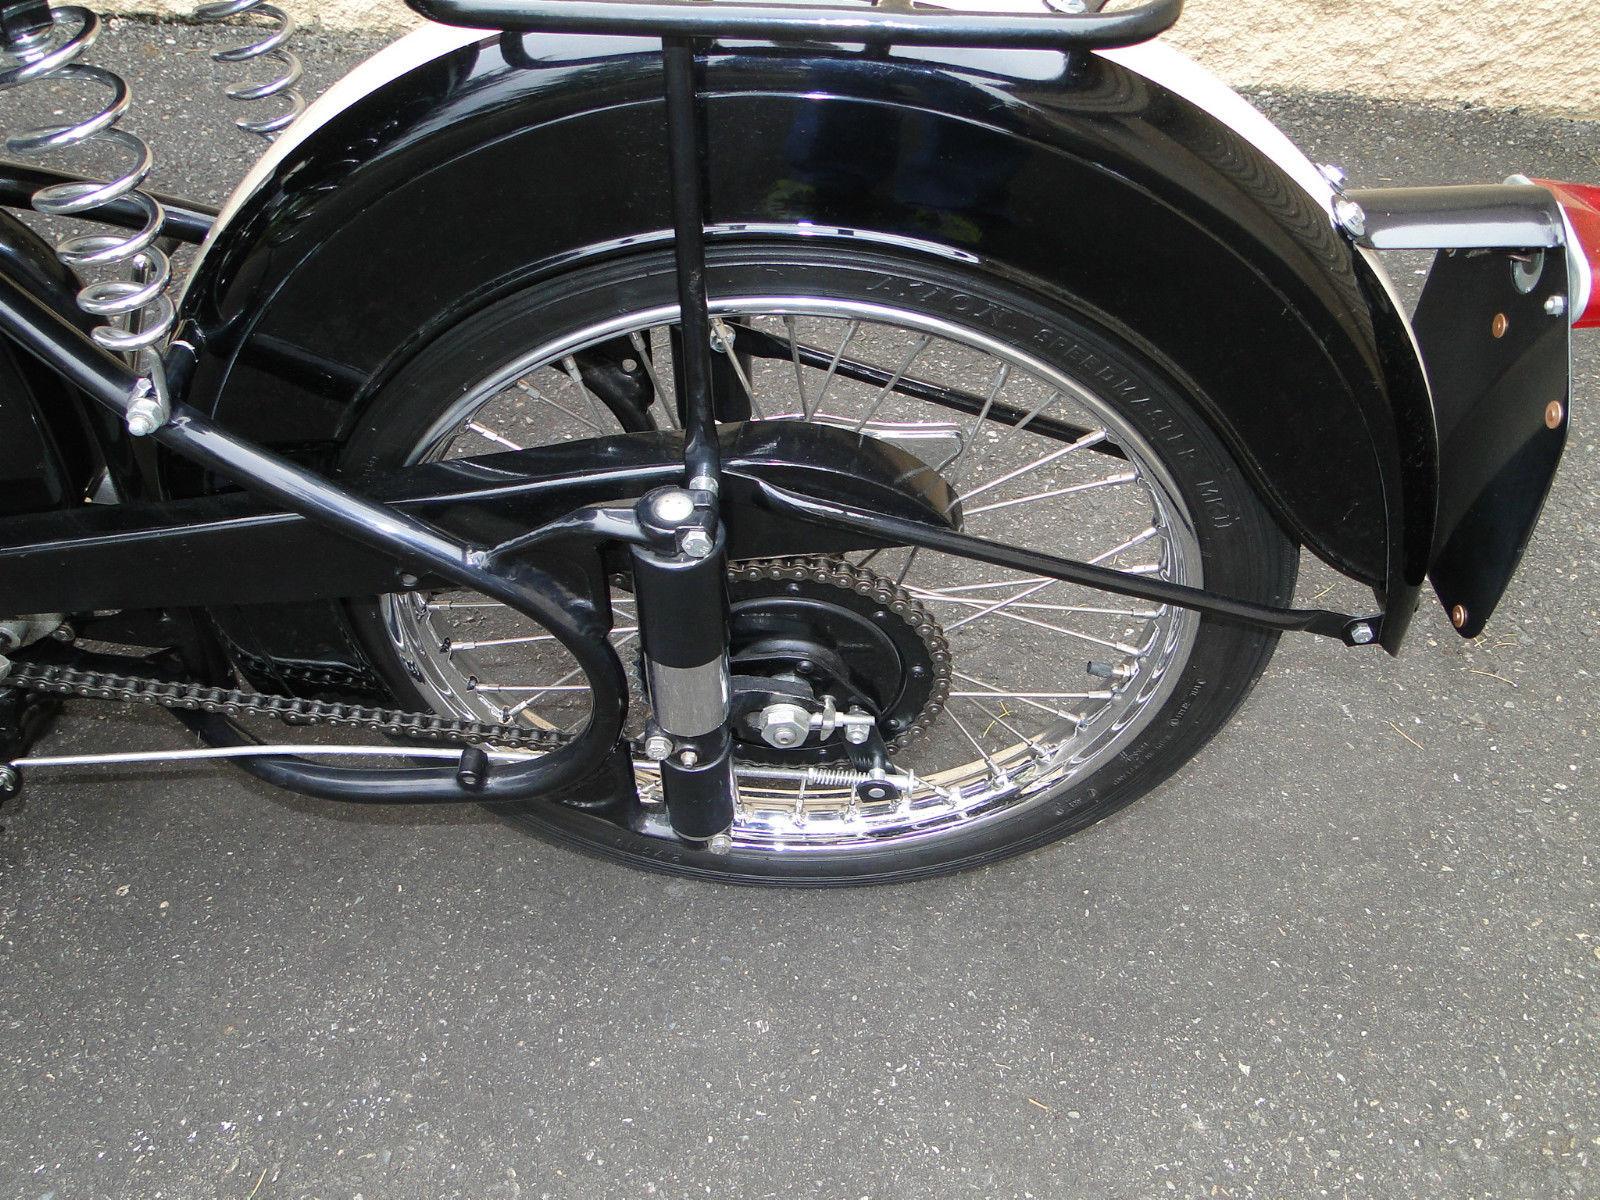 BSA Bantam - 1953 - Rear Wheel, Chain Adjuster, Chain and Sprocket.